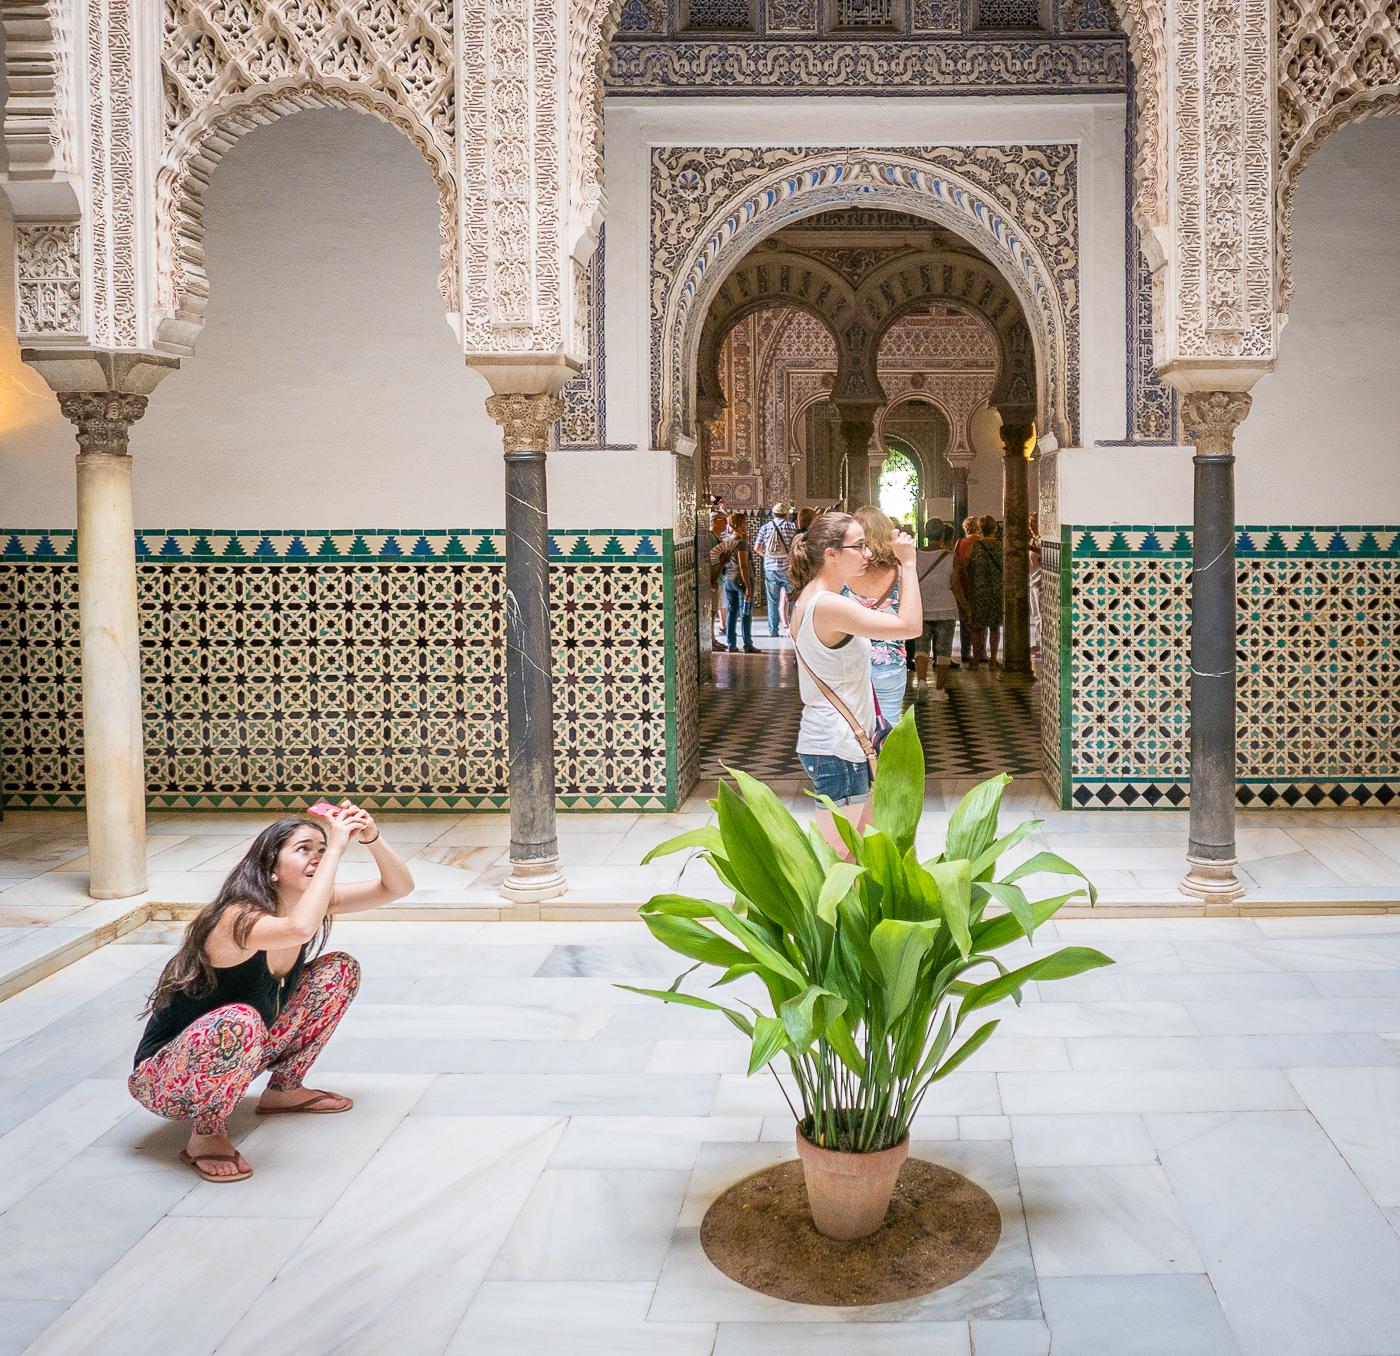 Tourist v traveler: people taking photos at Alcazar